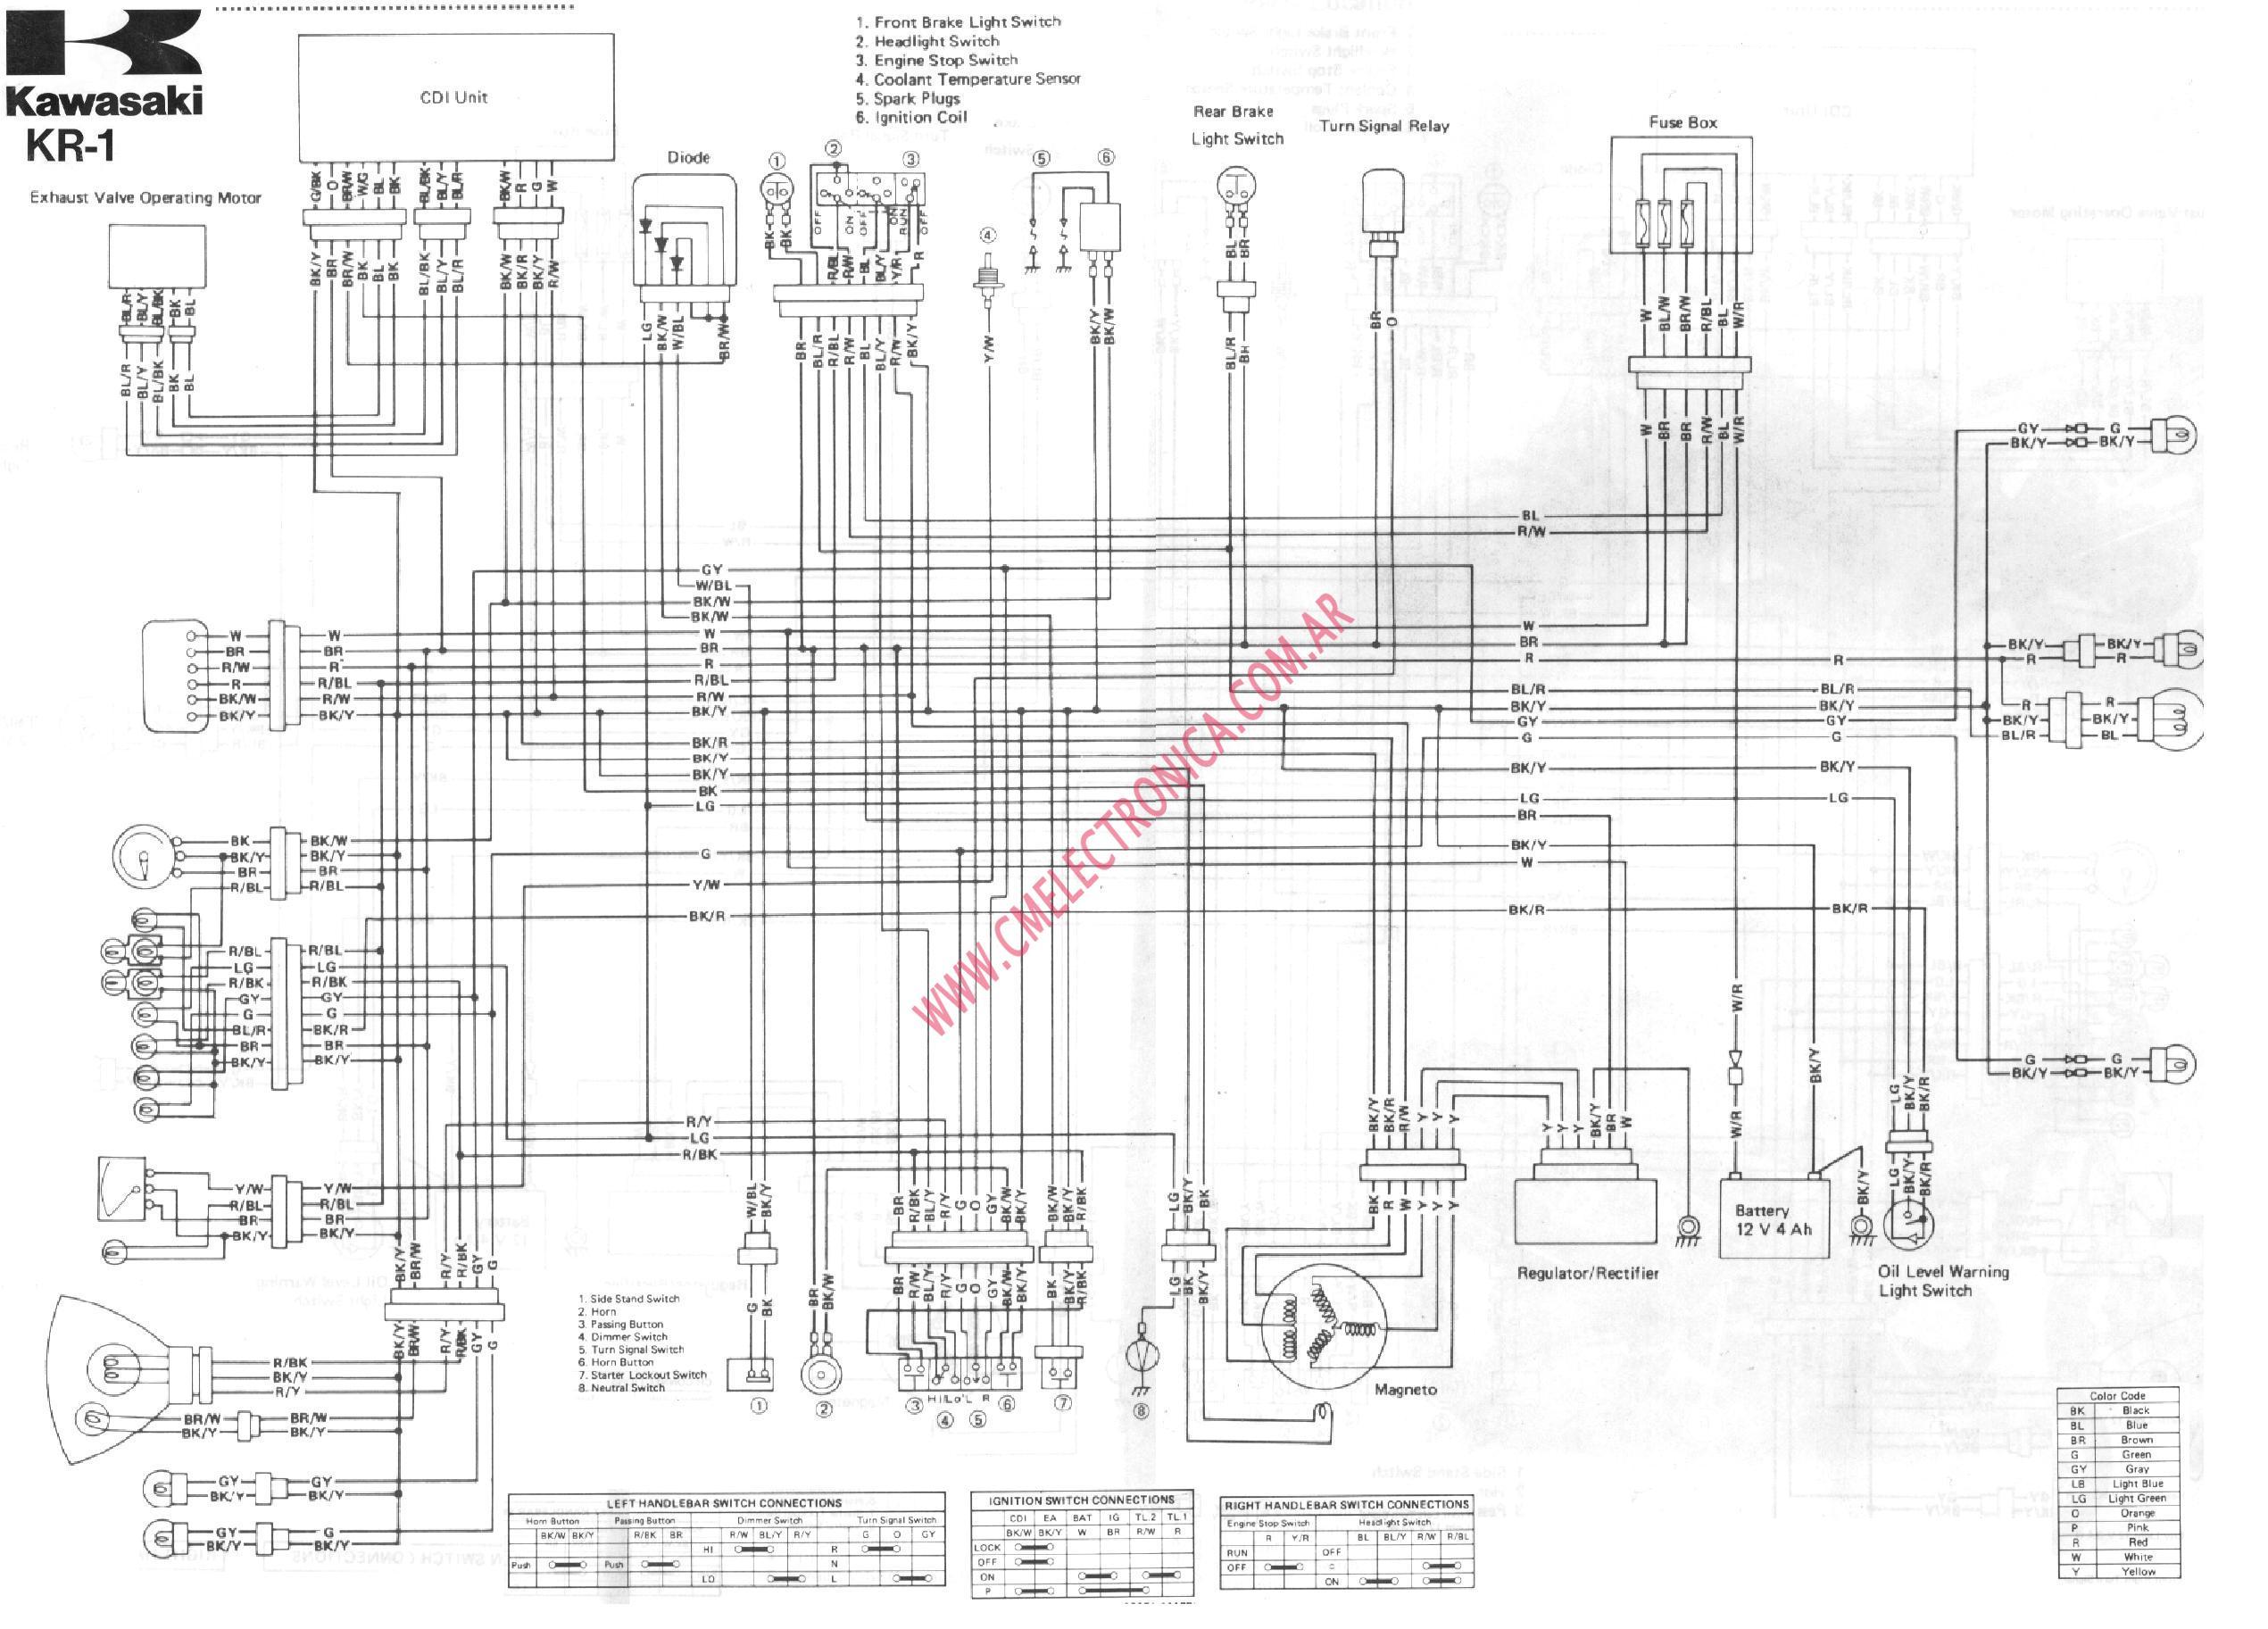 Awesome Honda Trx300Ex Wiring Diagram Wiring Diagram Database Wiring Cloud Waroletkolfr09Org